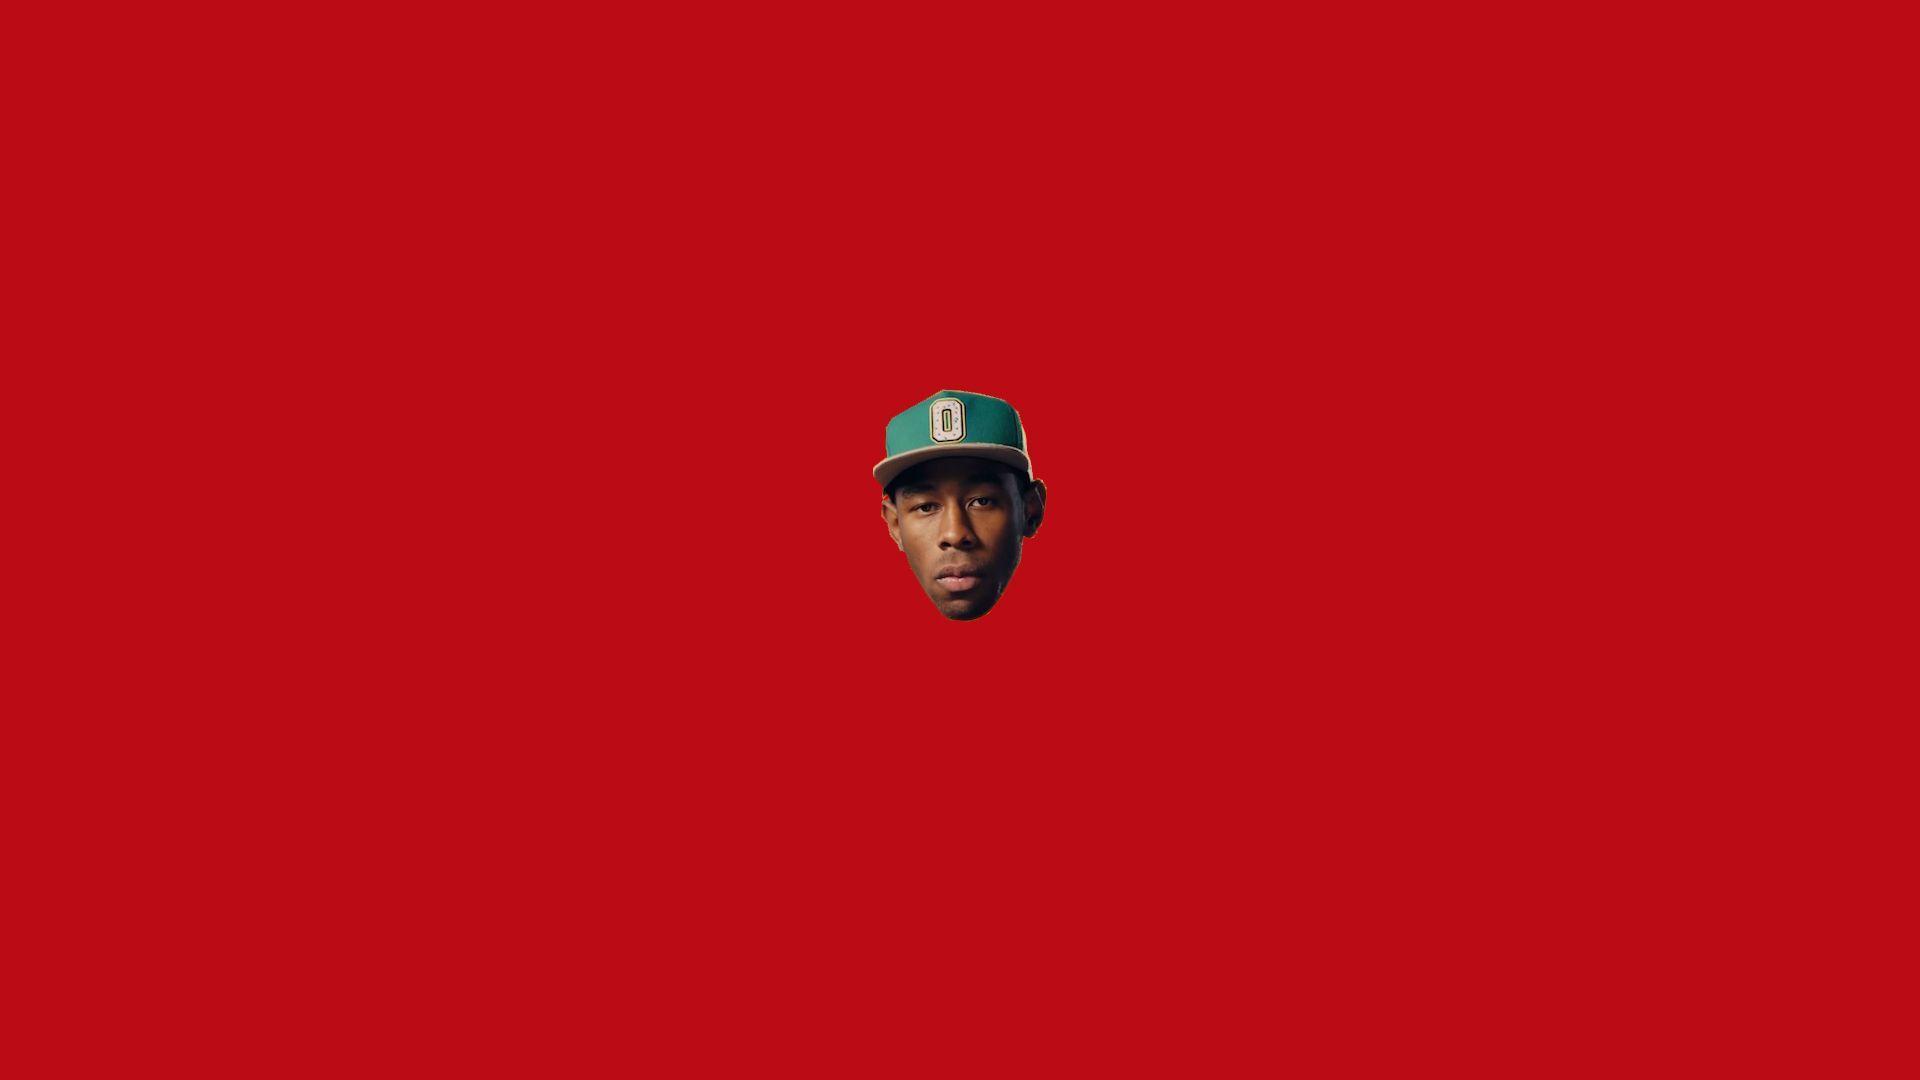 Tyler, The Creator Wallpapers - Wallpaper Cave